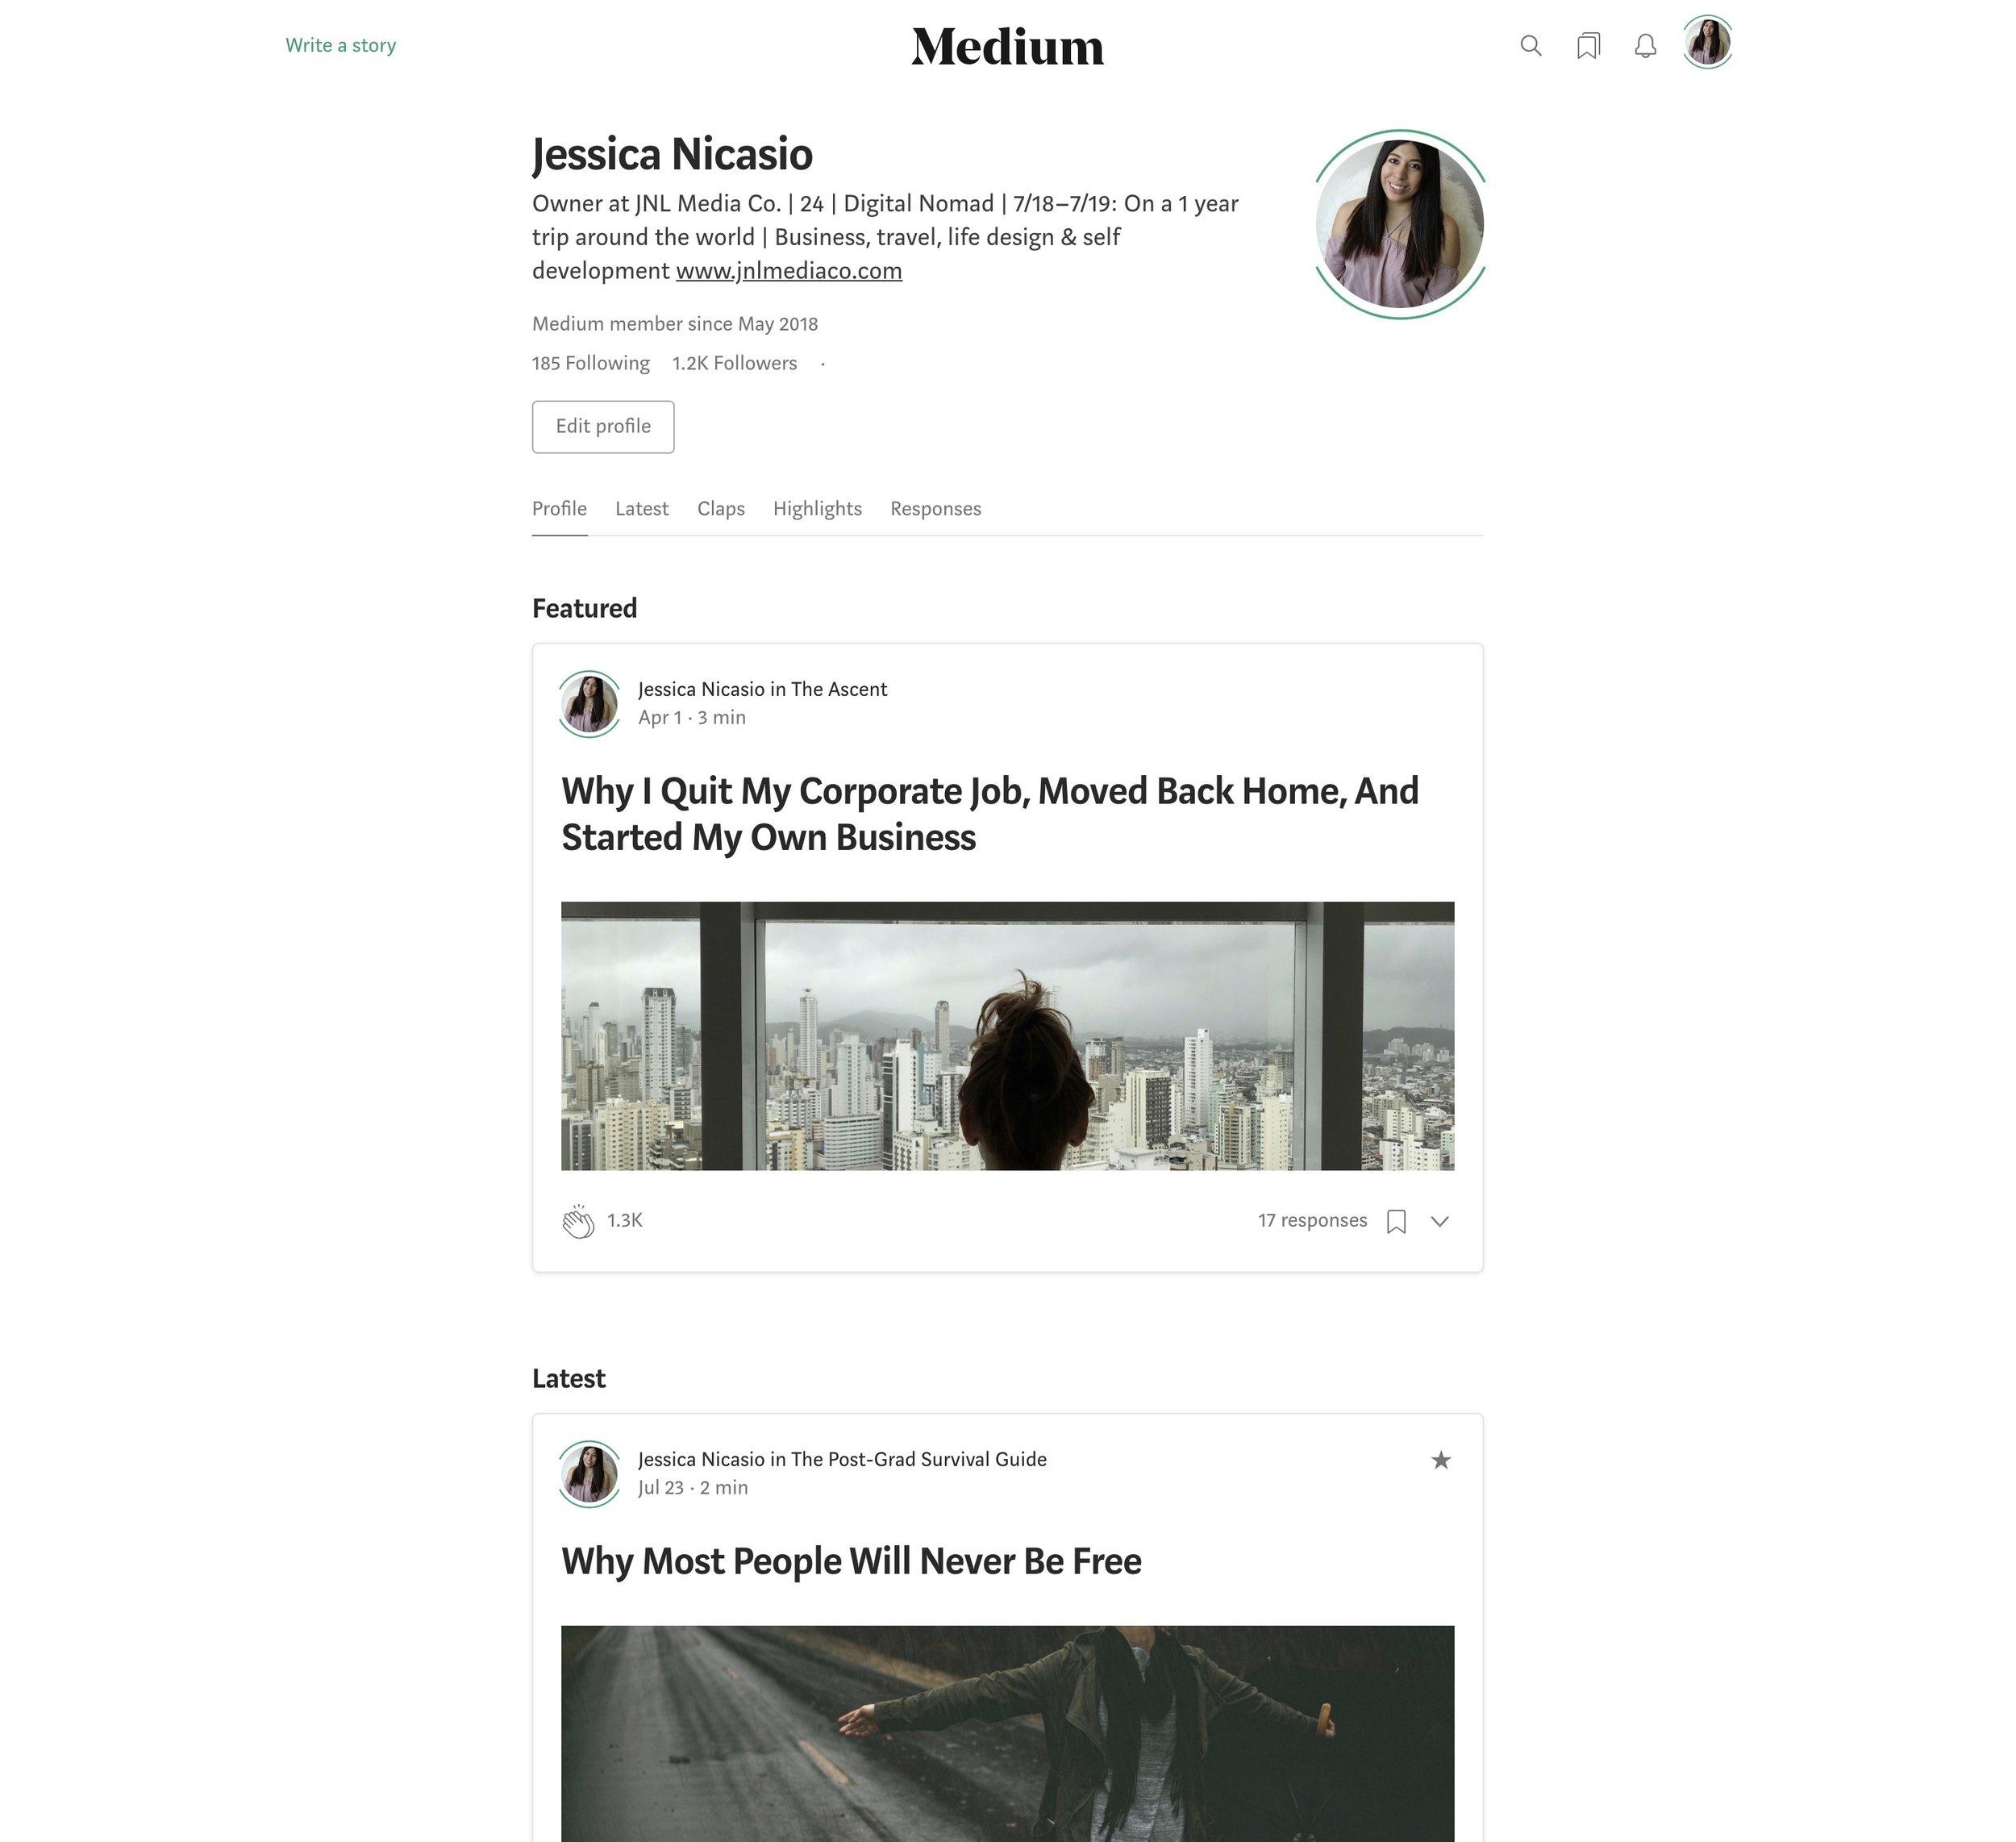 My Medium profile